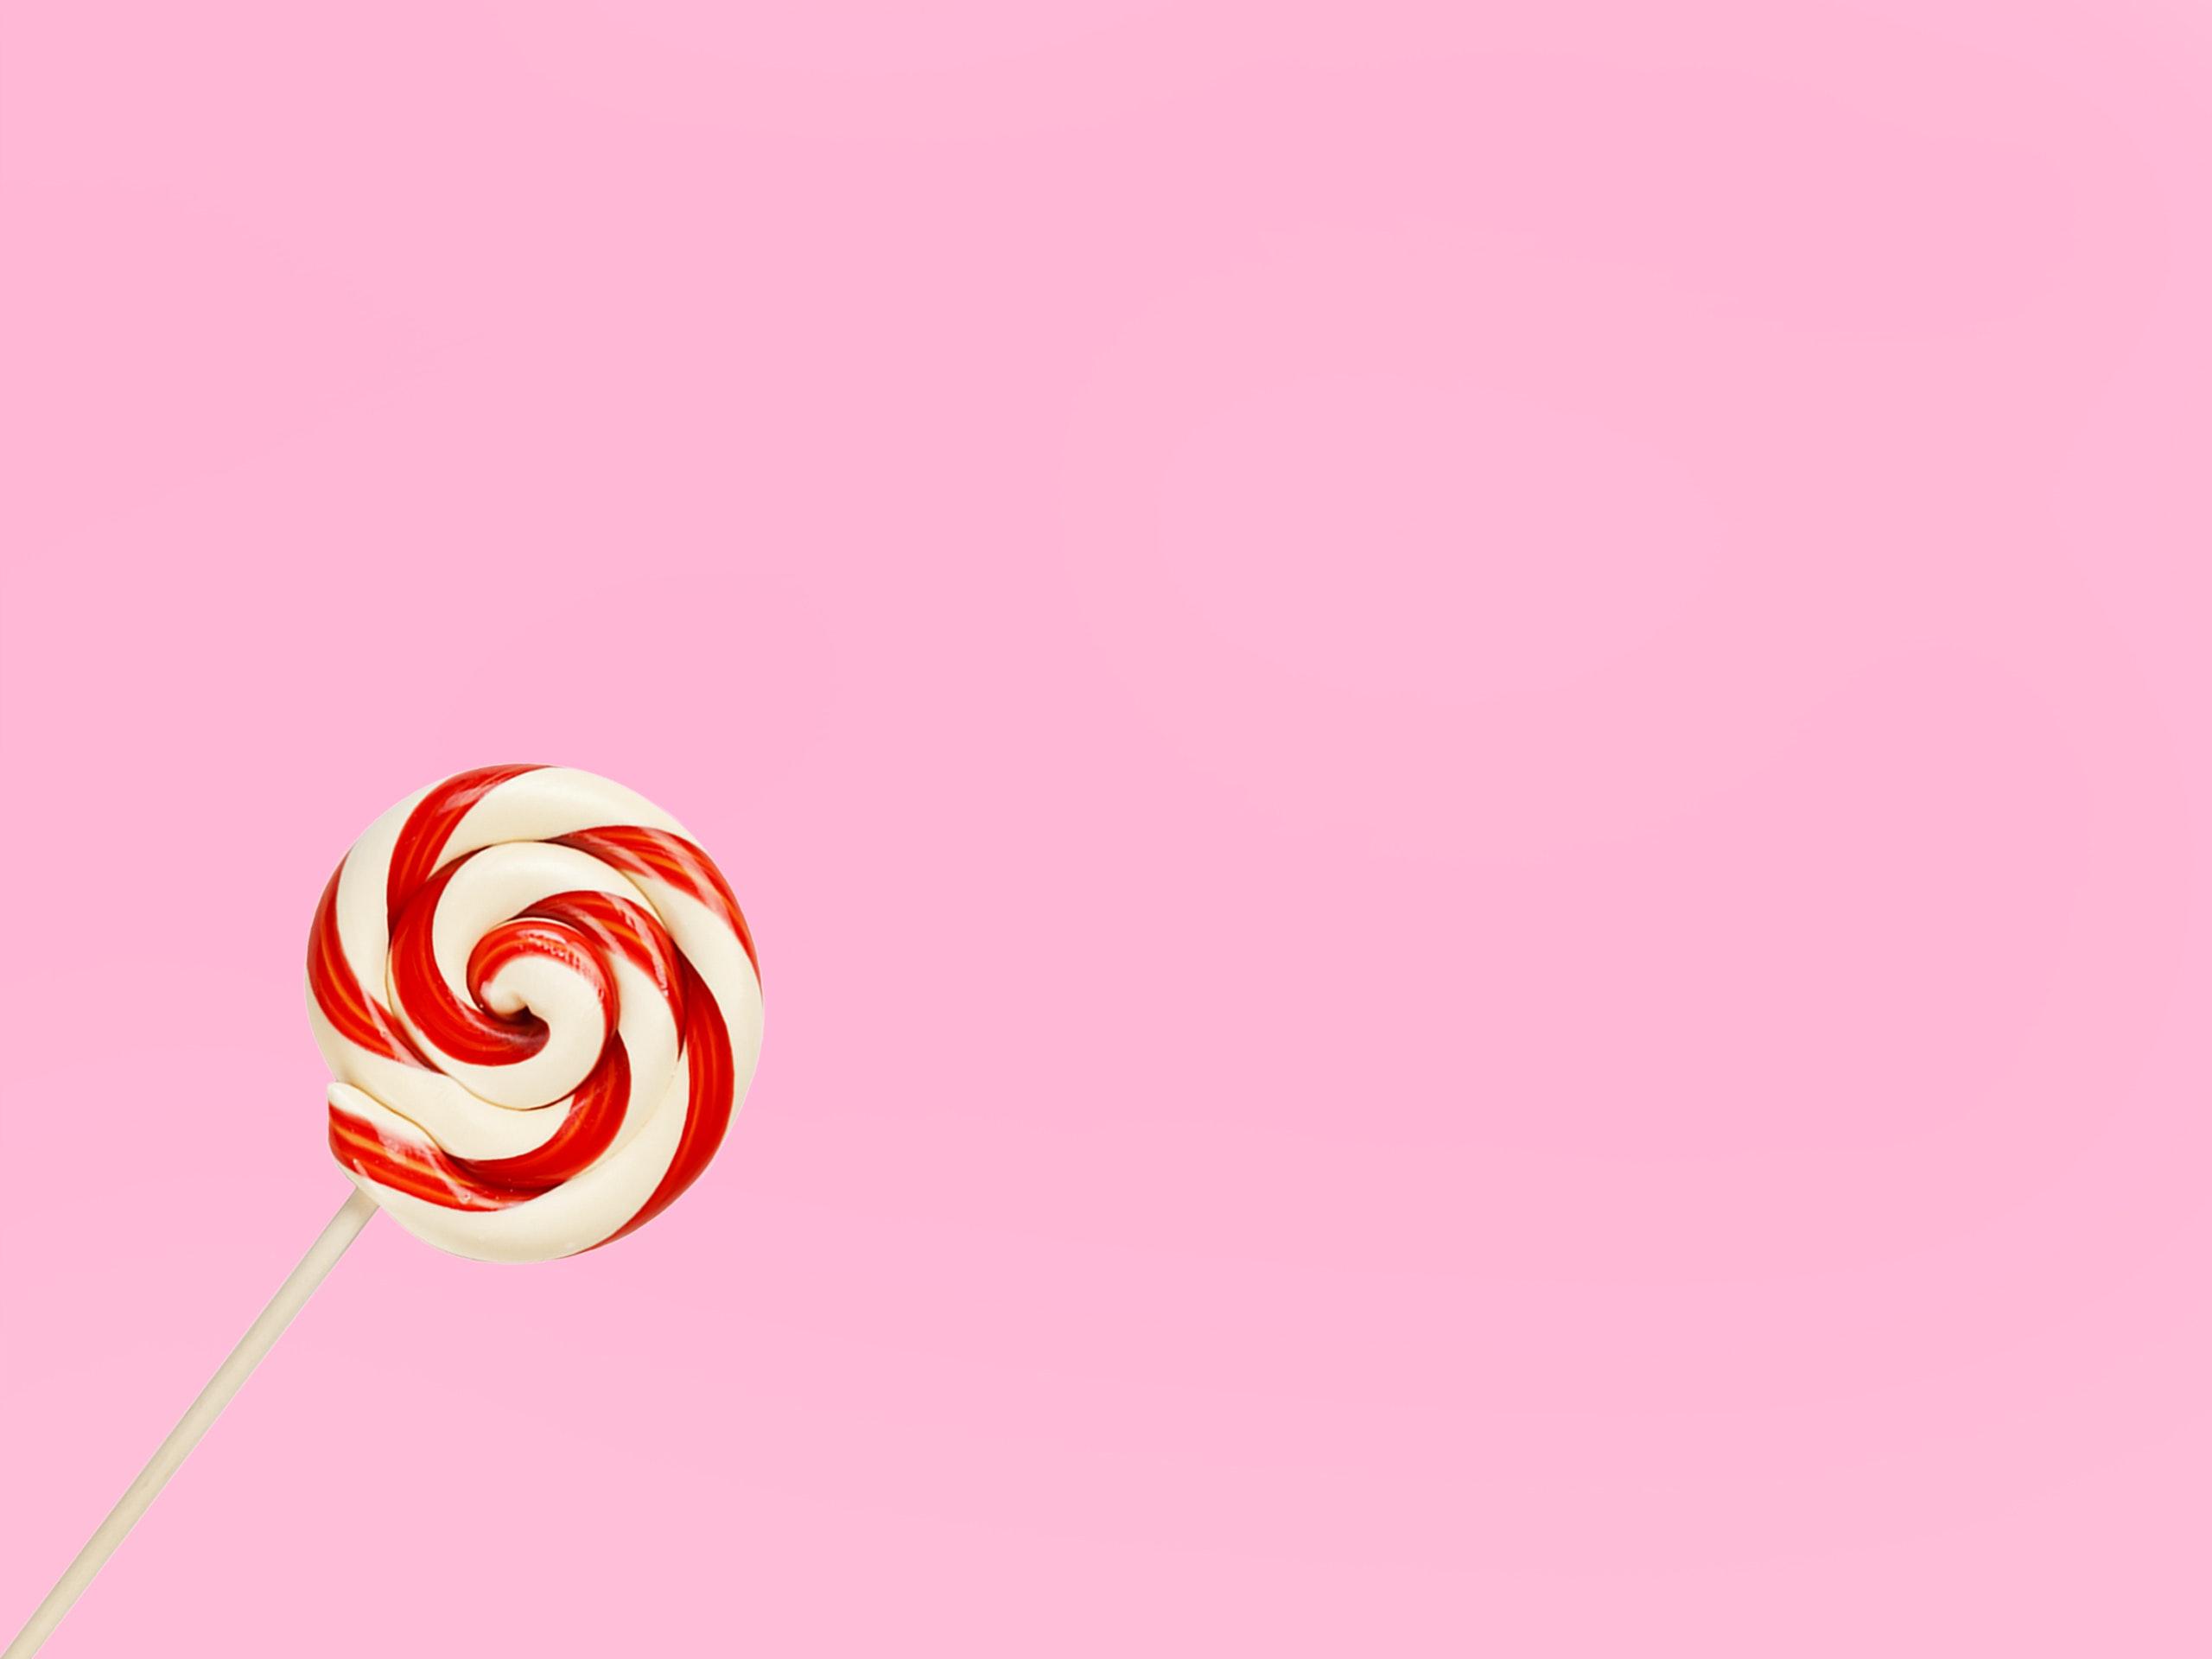 swirl-candy-stick